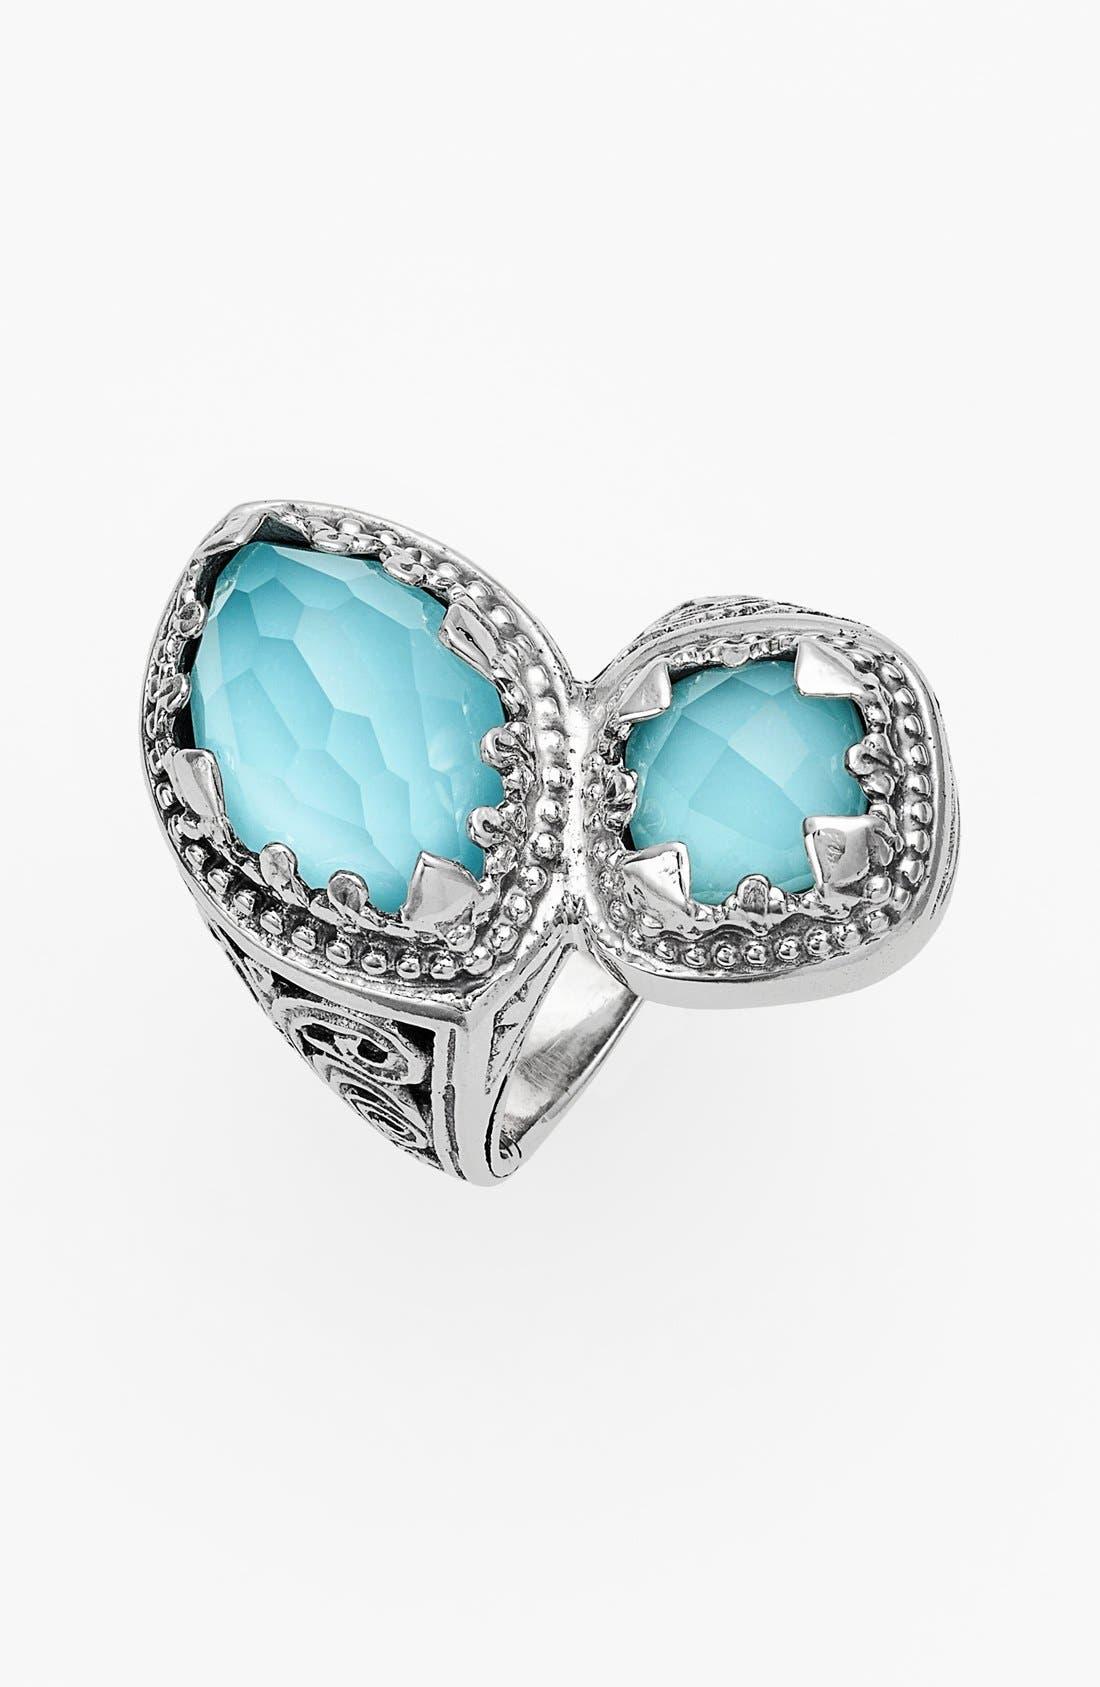 Main Image - Konstantino 'Aegean' Stone Ring